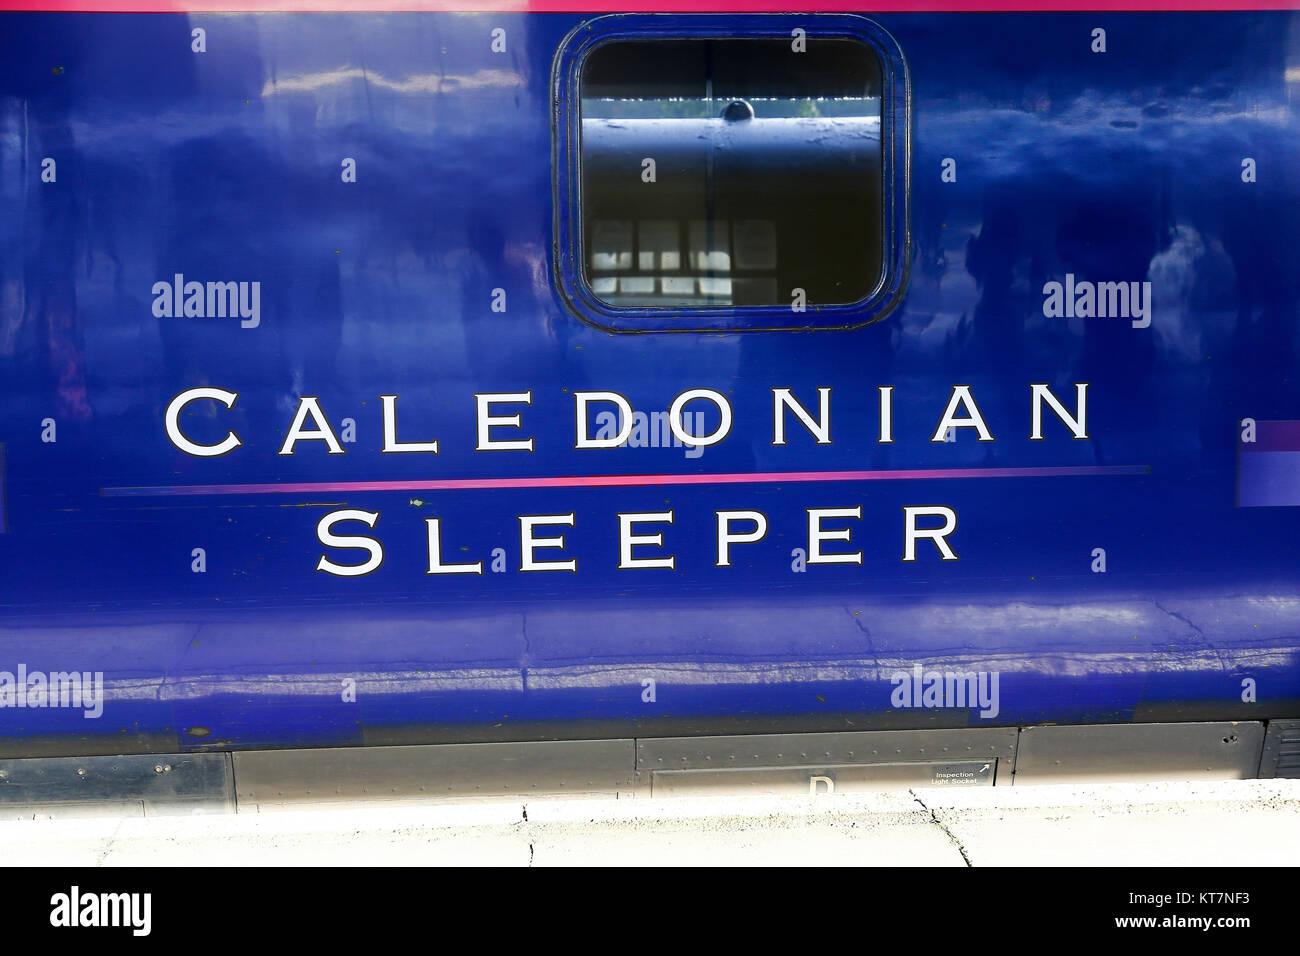 A Caledonian Sleeper Carriage An Overnight Train Service